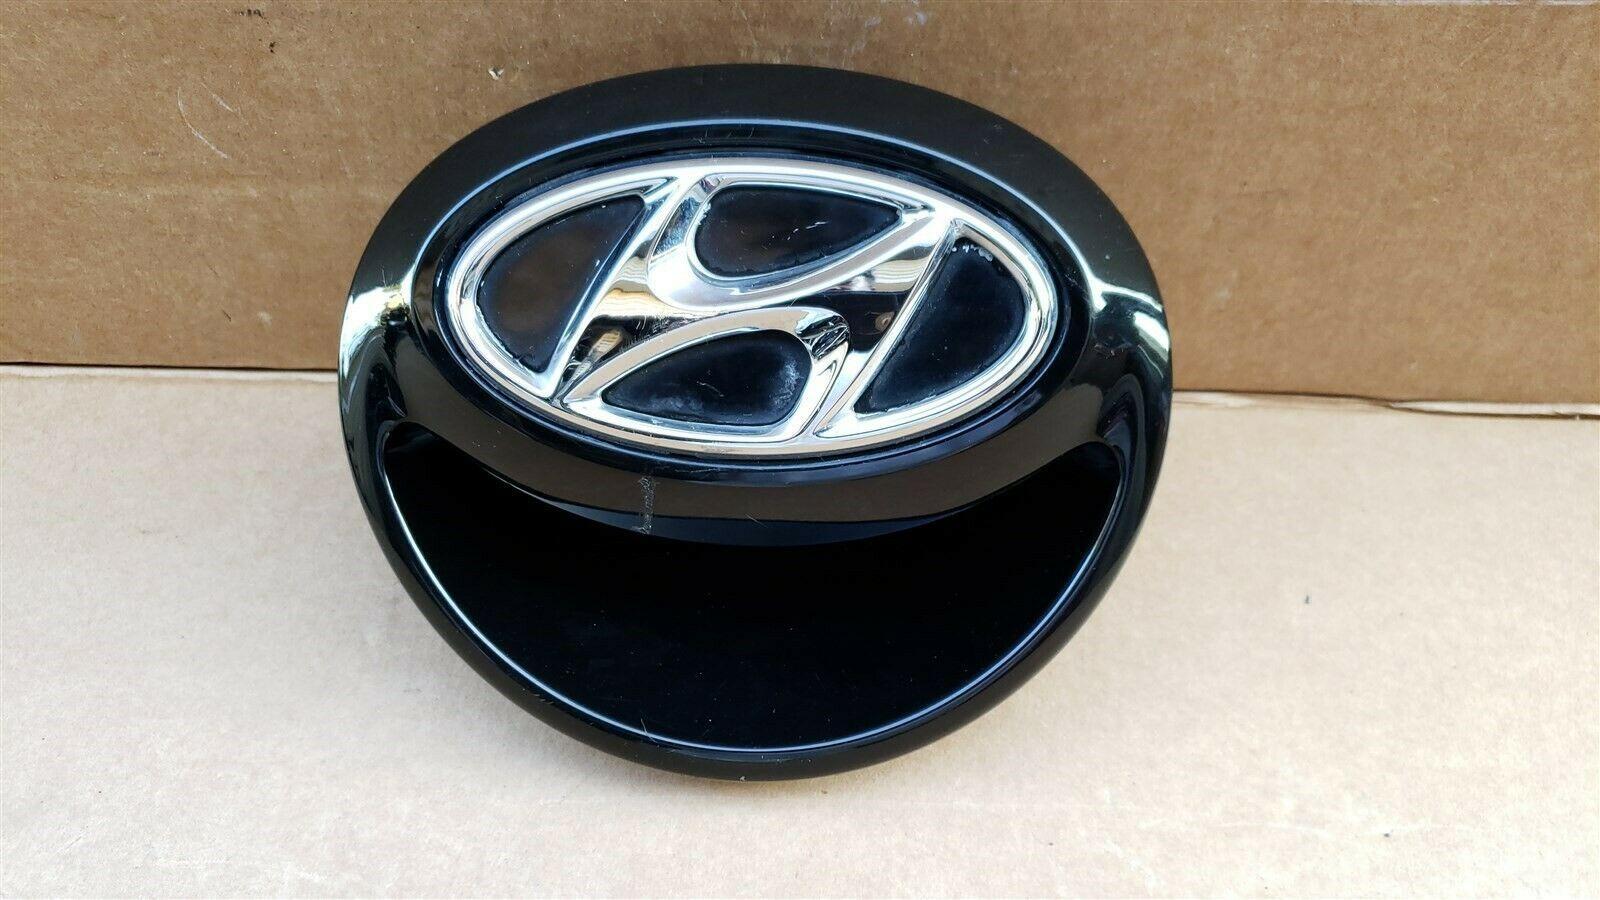 12-16 Hyundai Veloster Rear Hatch Handle Tailgate Emblem